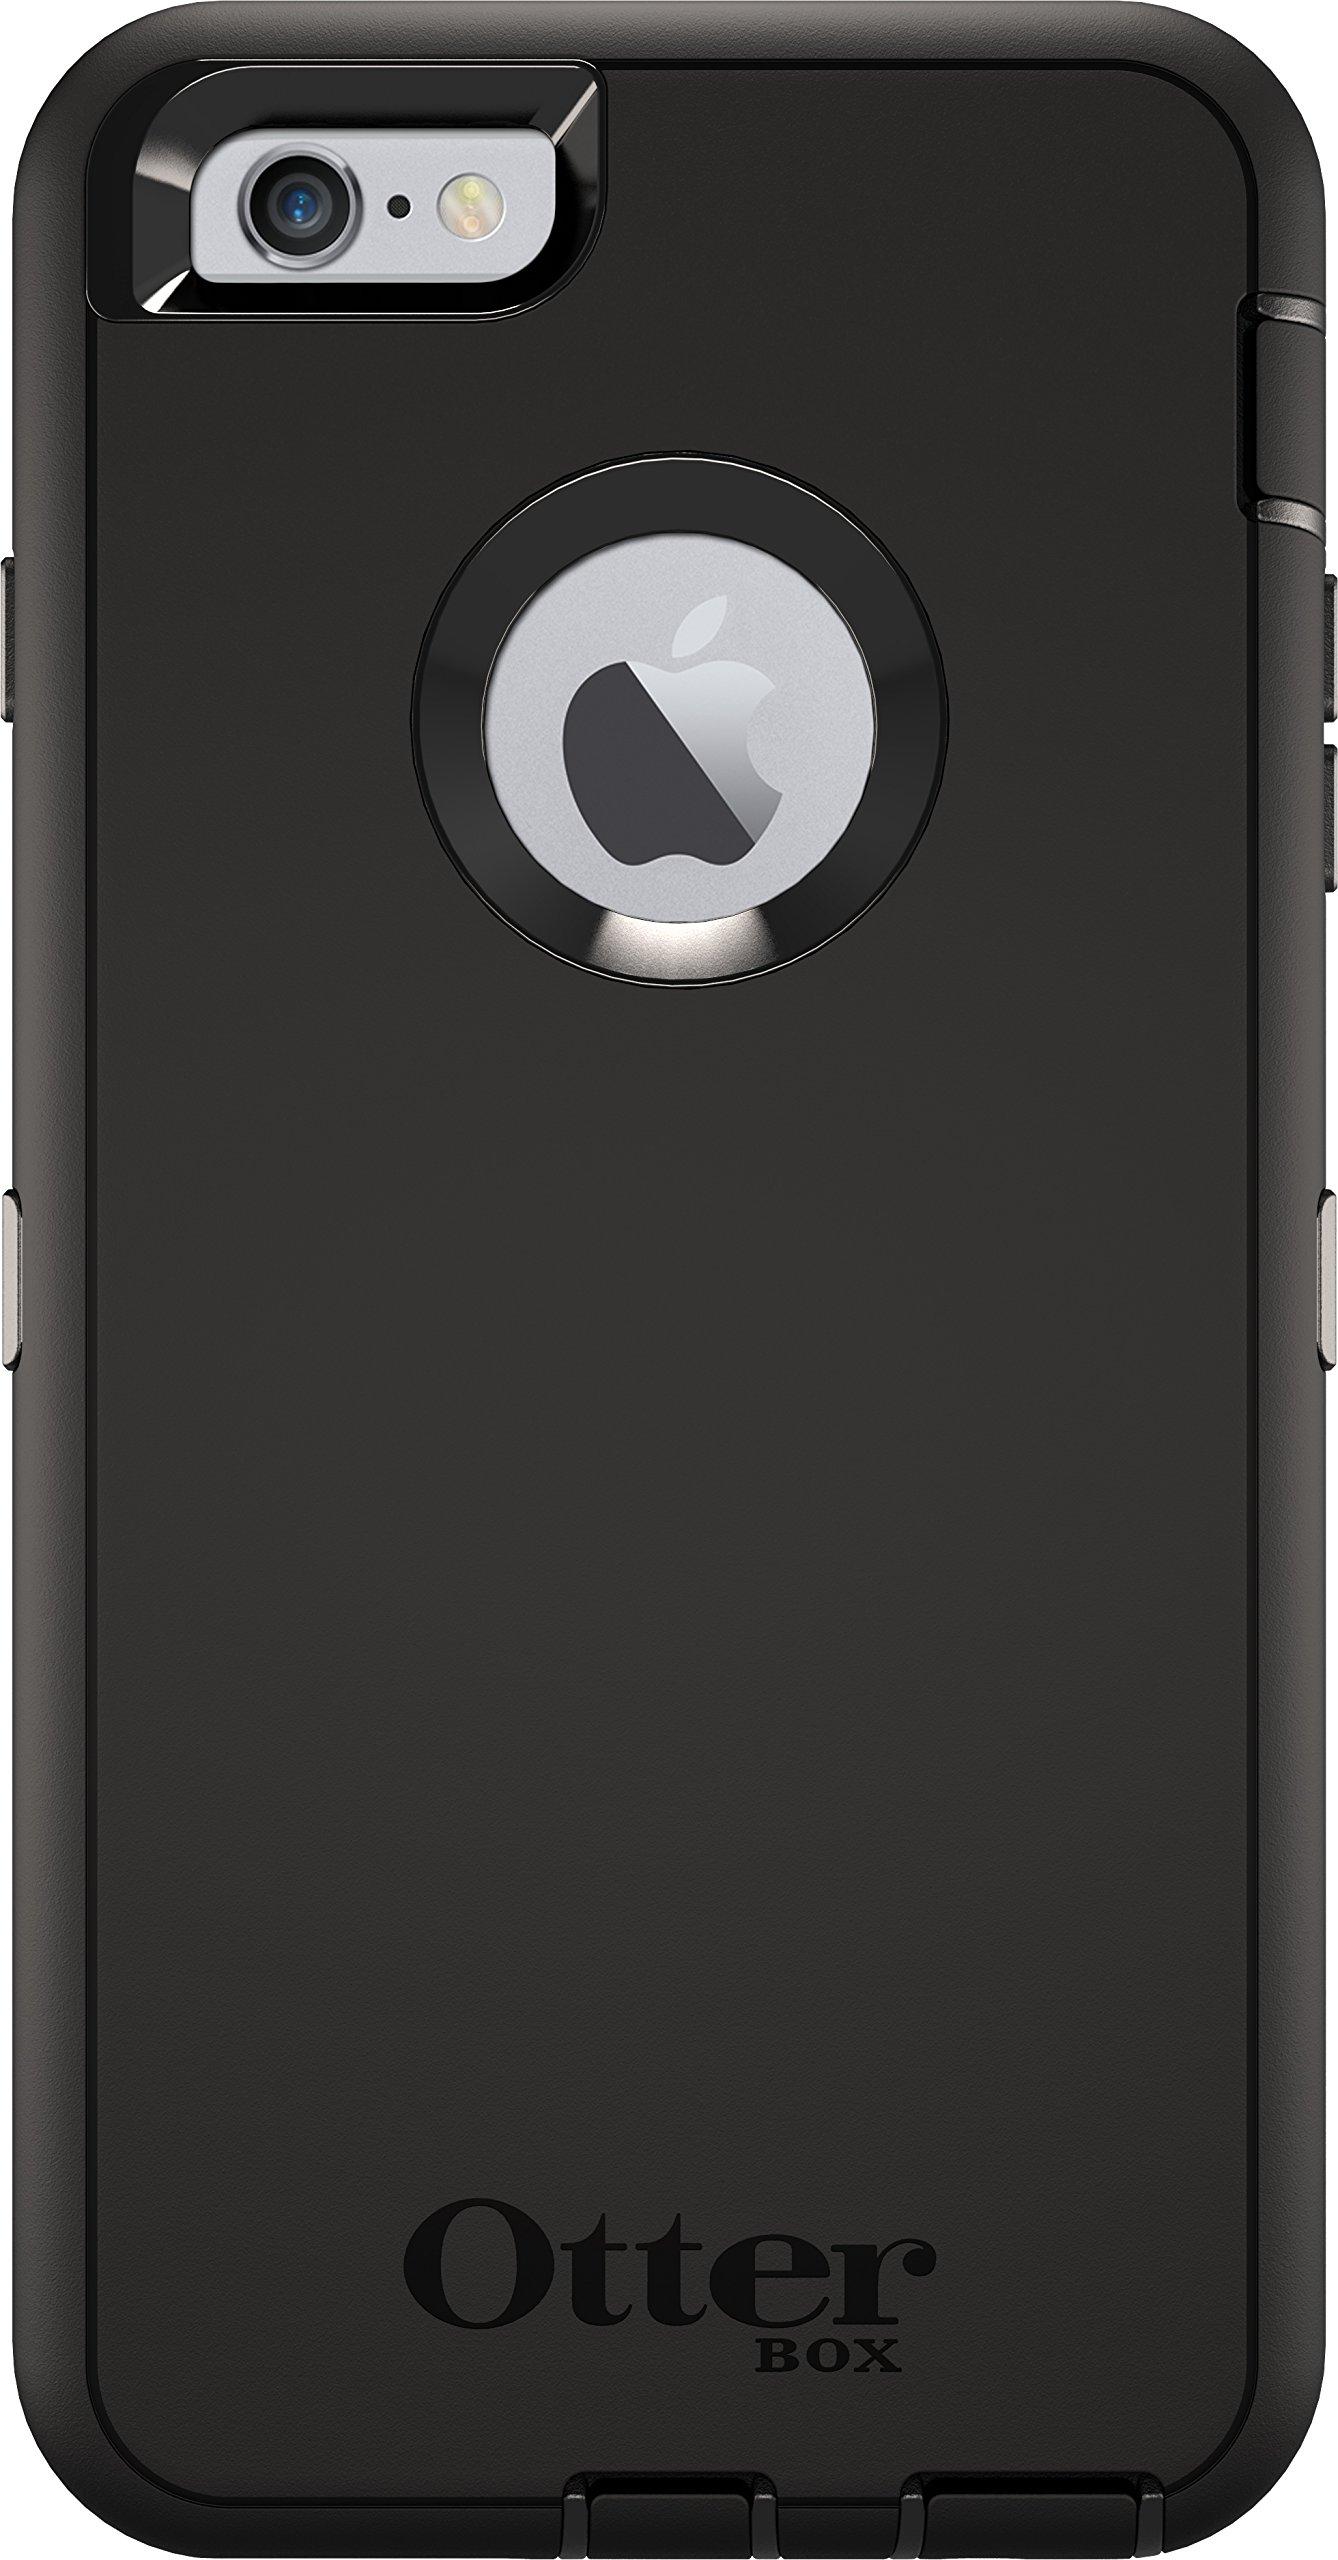 OtterBox Defender iPhone 6 Plus/6s Plus ONLY Case - Black